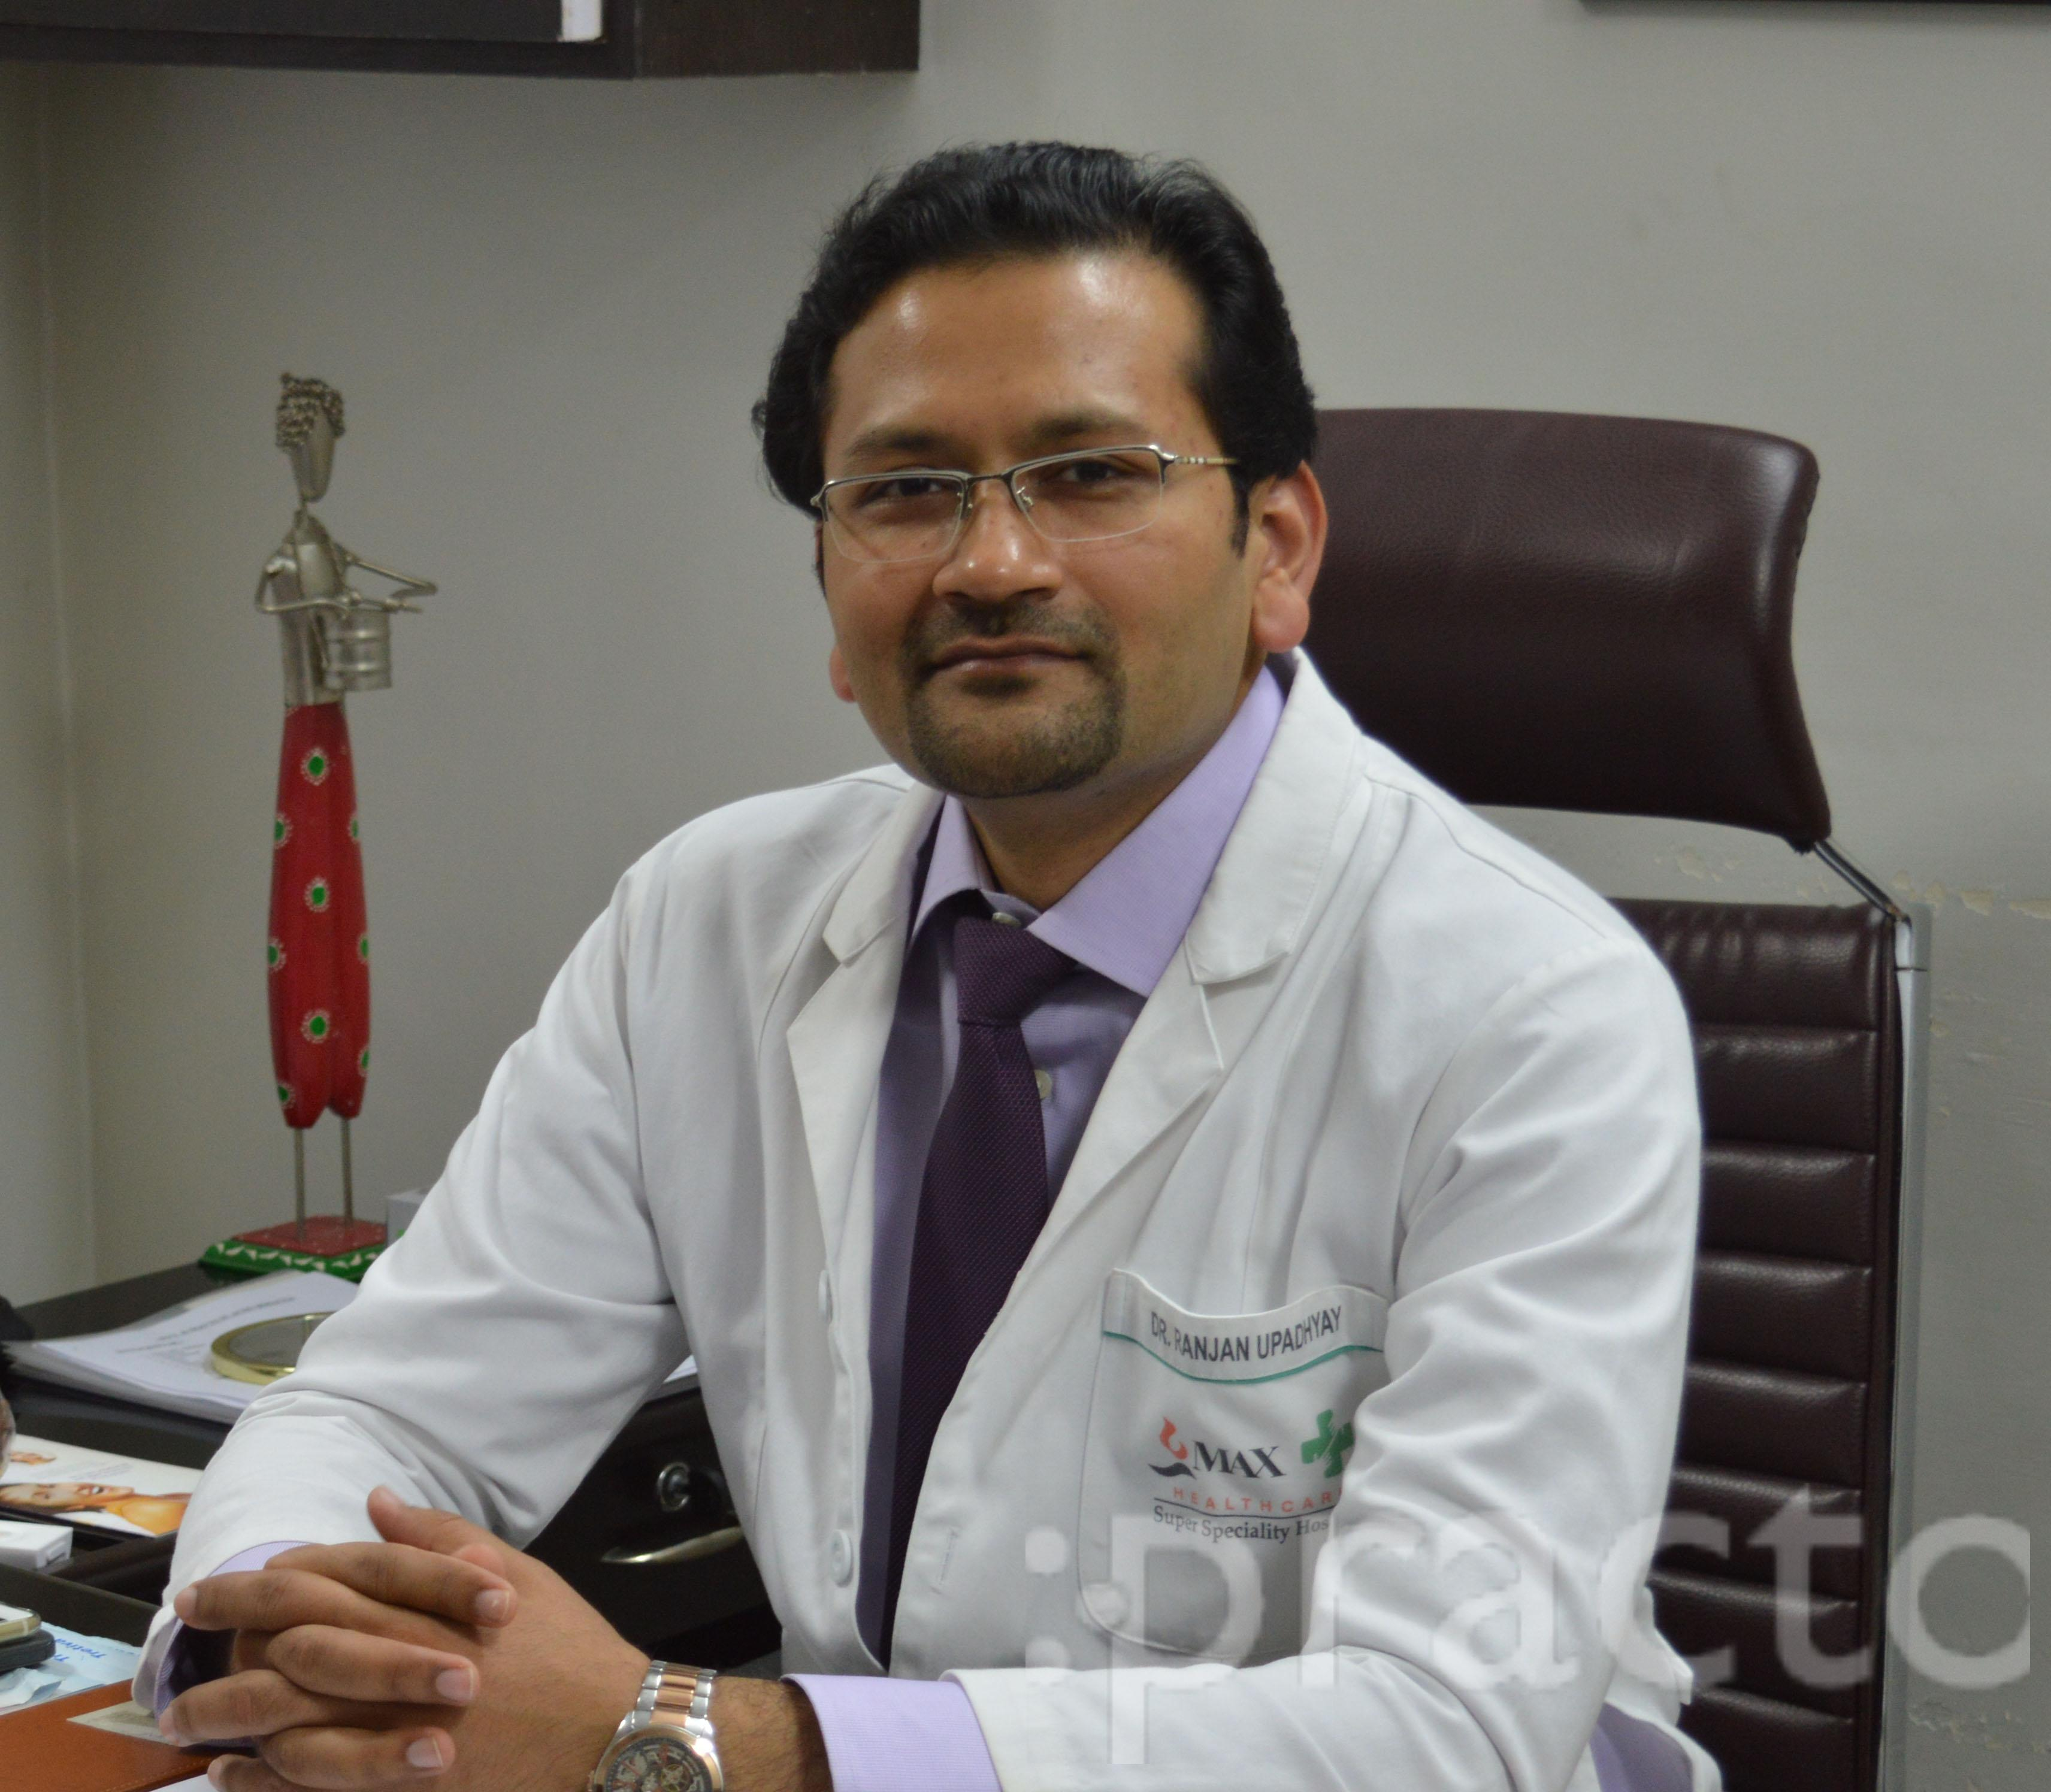 Dr. Ranjan Upadhyay - Dermatologist